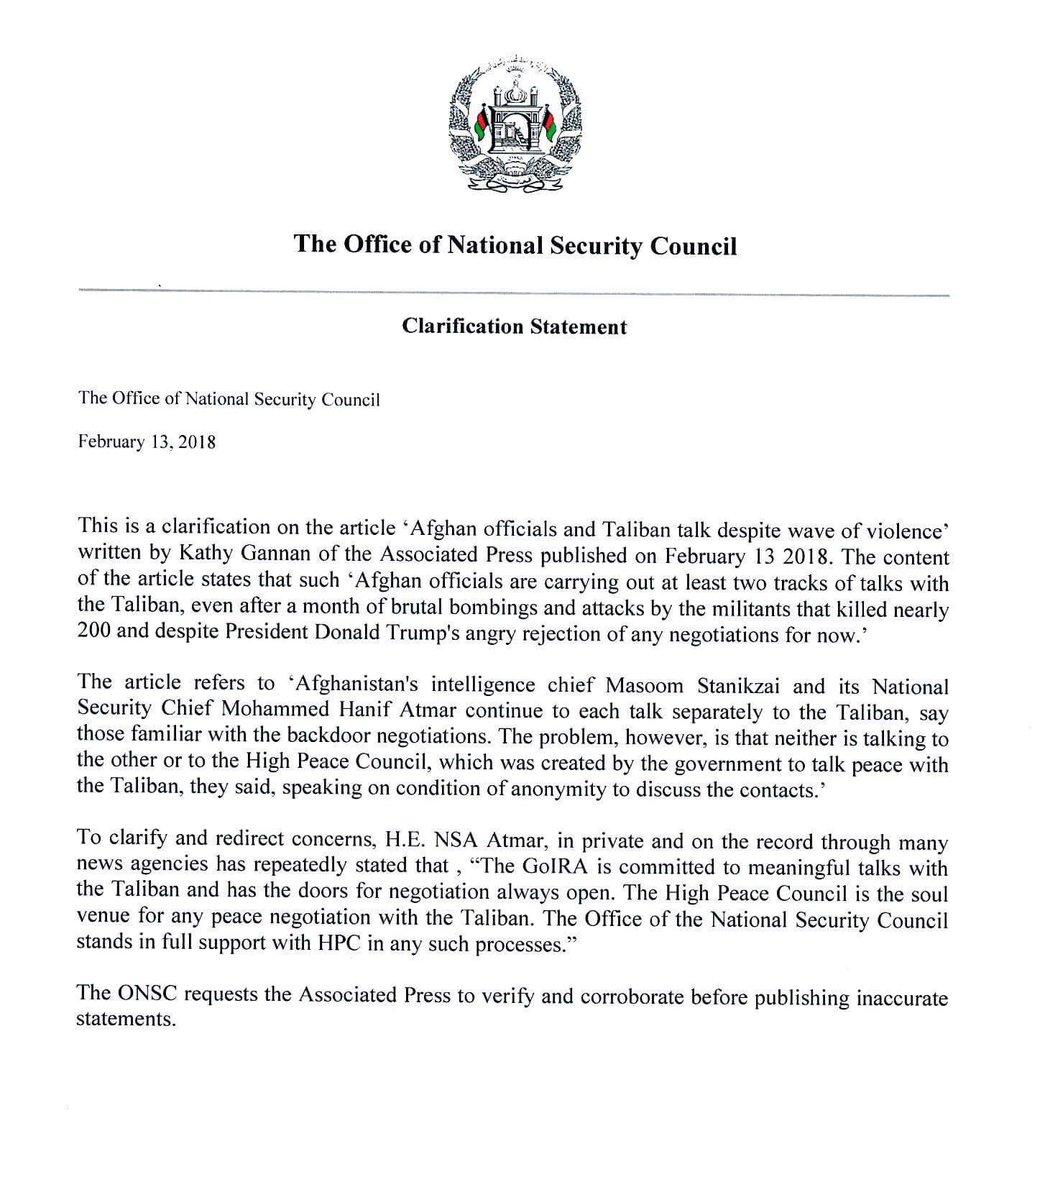 Clarification Statement on Associated Press by Kathy Gannon #NSAATMAR #Clarification